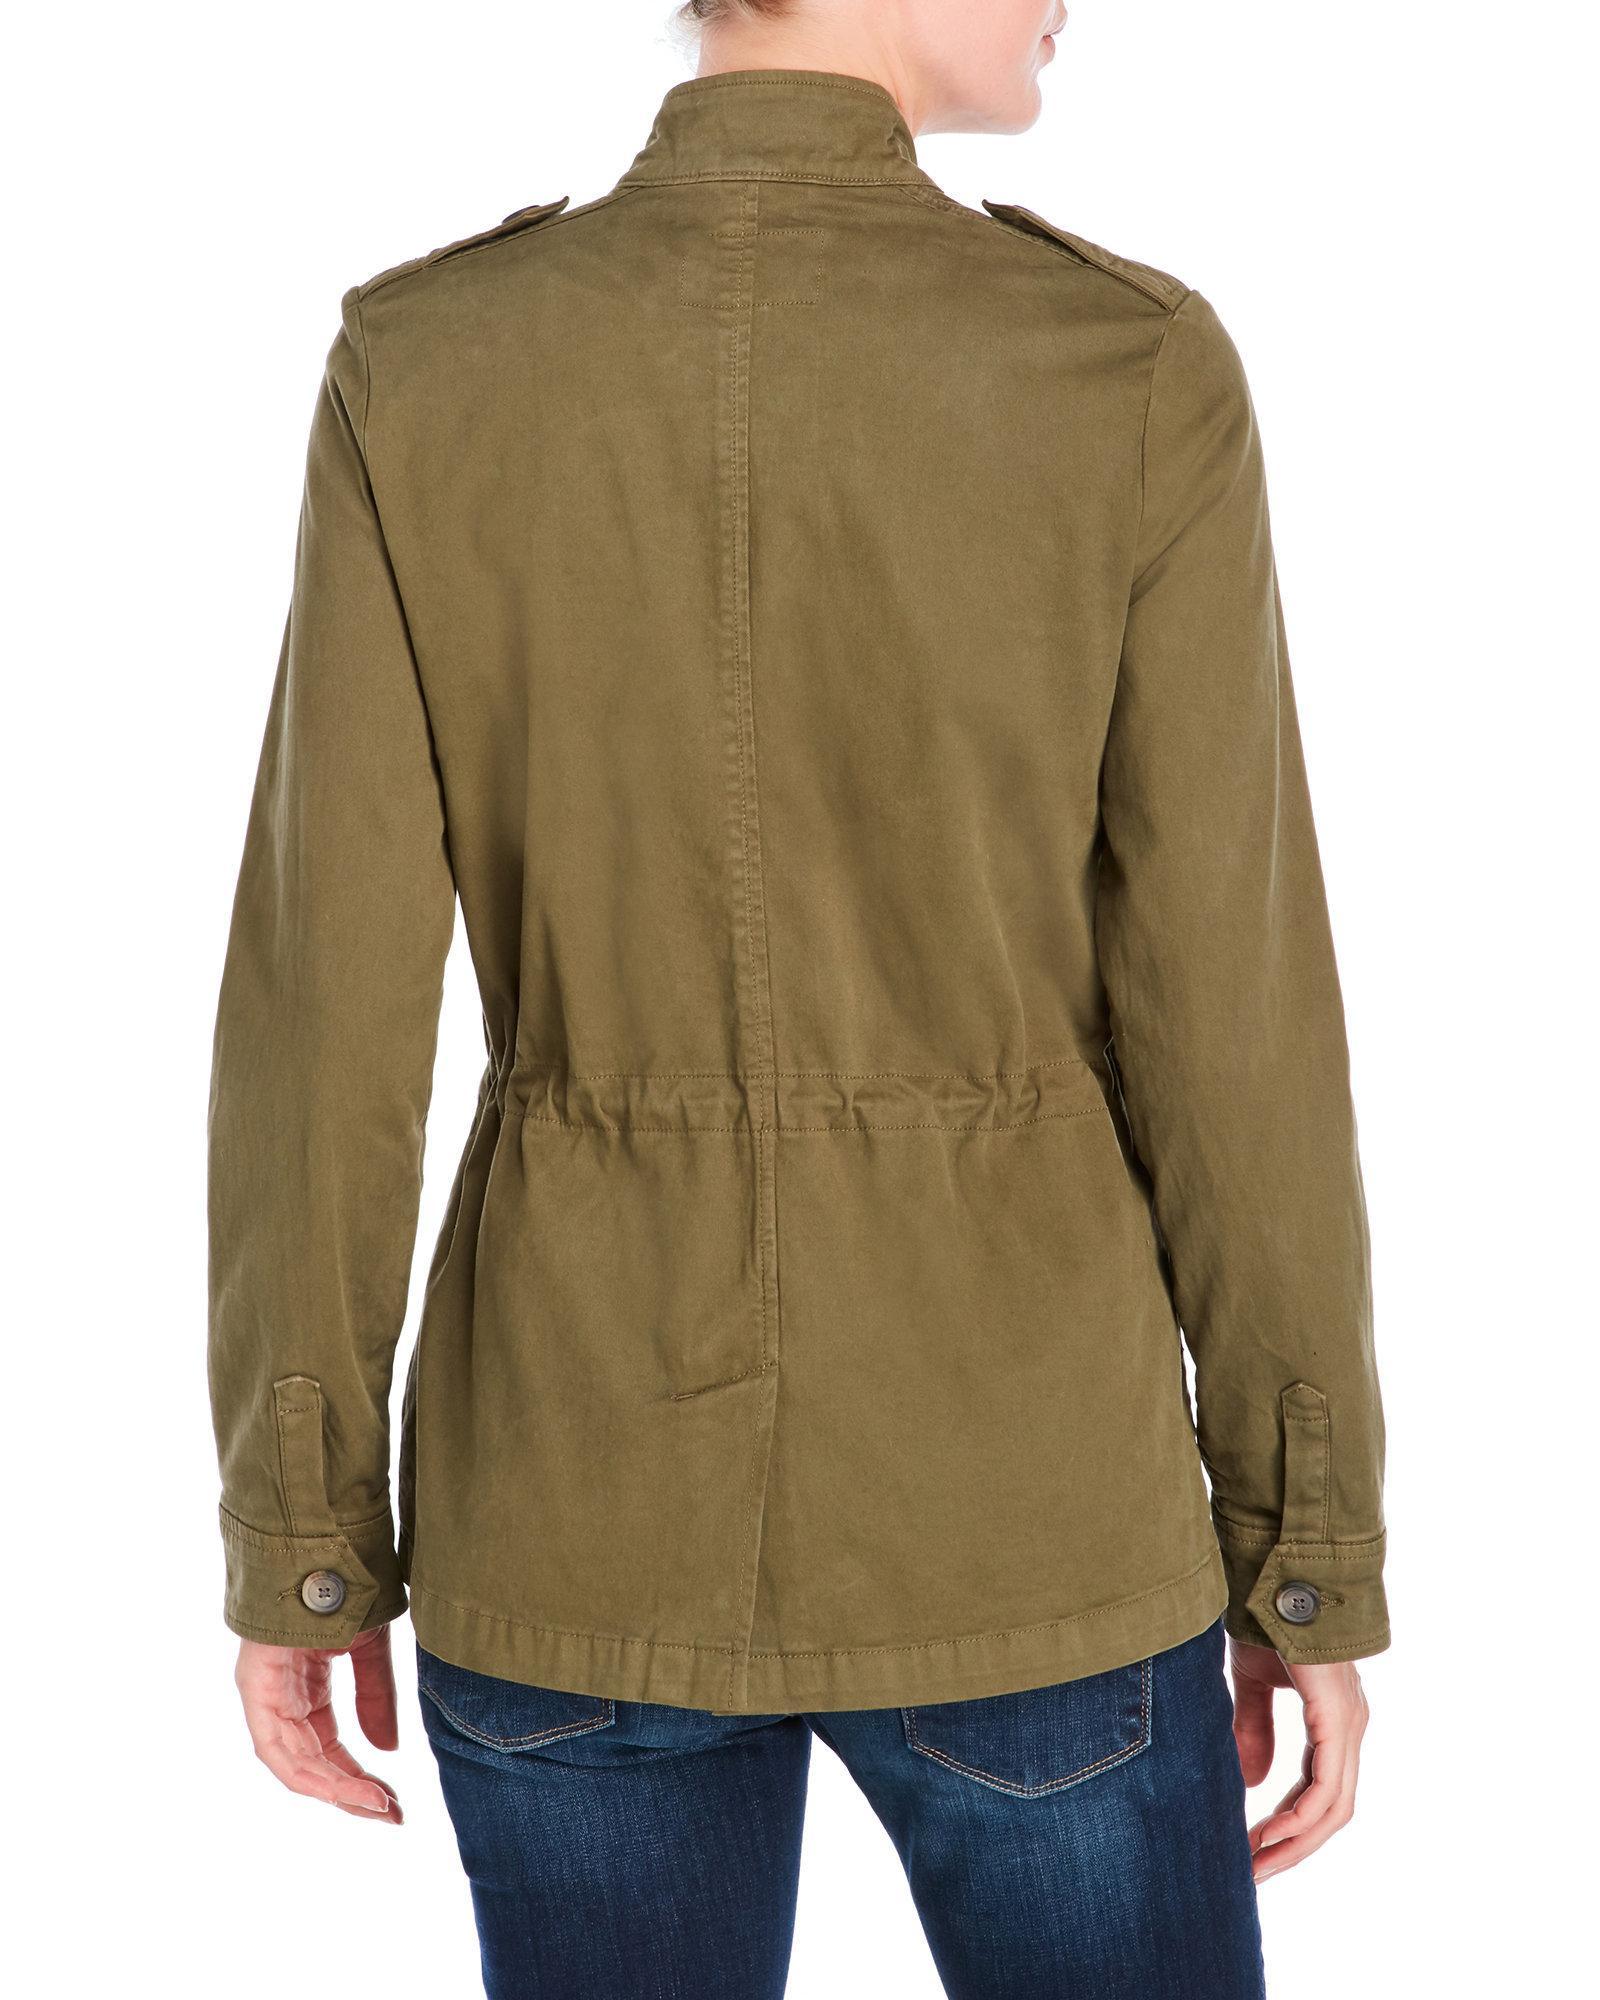 Https Clothing Ariat Ideal Down Vest Azalea 2017 01 Nesha Linen Pants In Olive 2515 4622 0bd55746 Jpeg